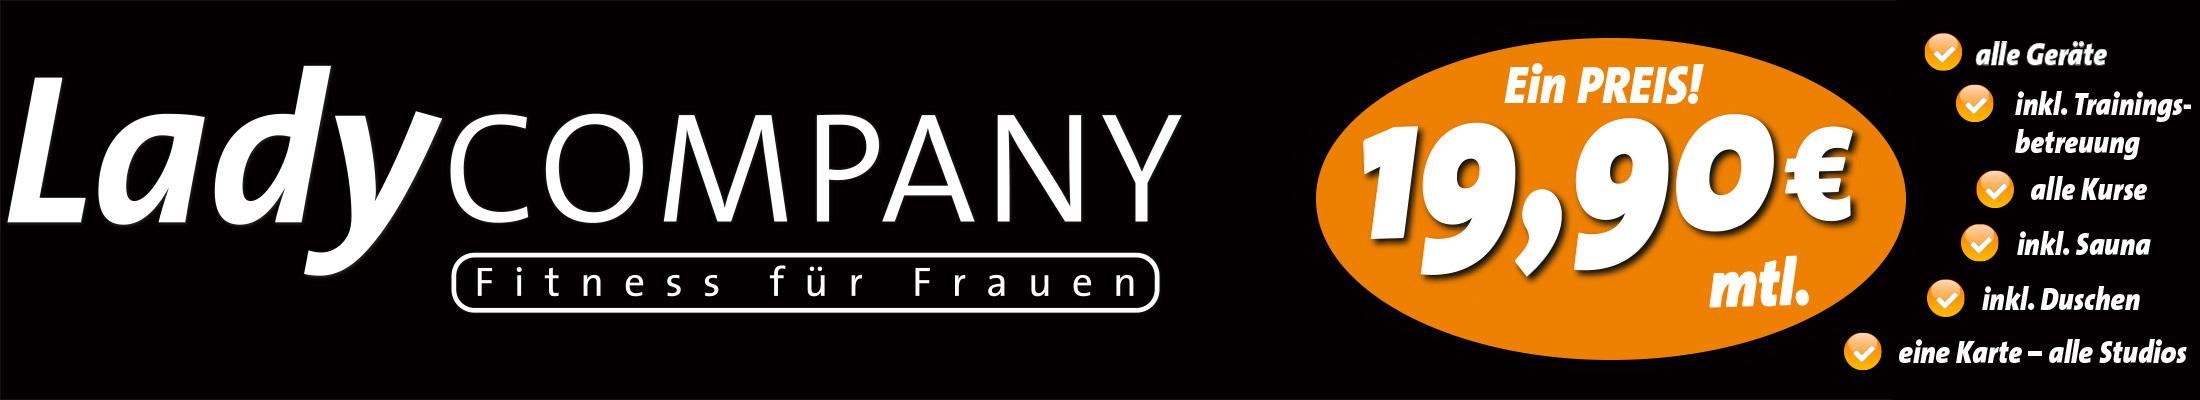 Ladycompany – Fitness für Frauen Logo